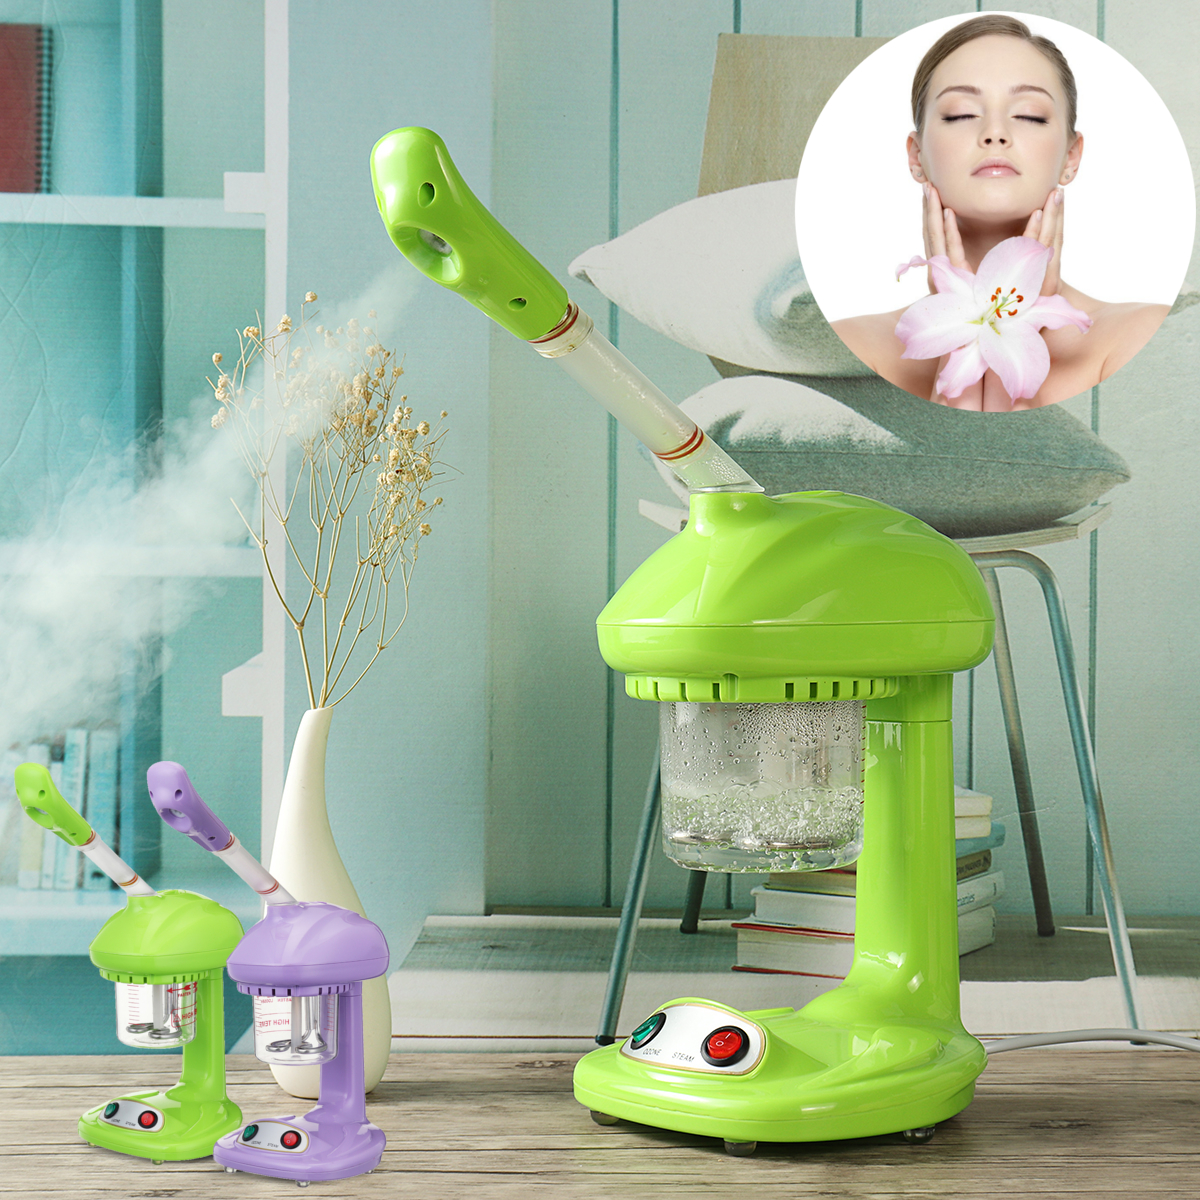 110V/220V US/EU Plug 480W Mini Table Facial Steamer Household Beauty Hot Spray Salon Spa Equipment Machine face Spa Device in garden mini spa